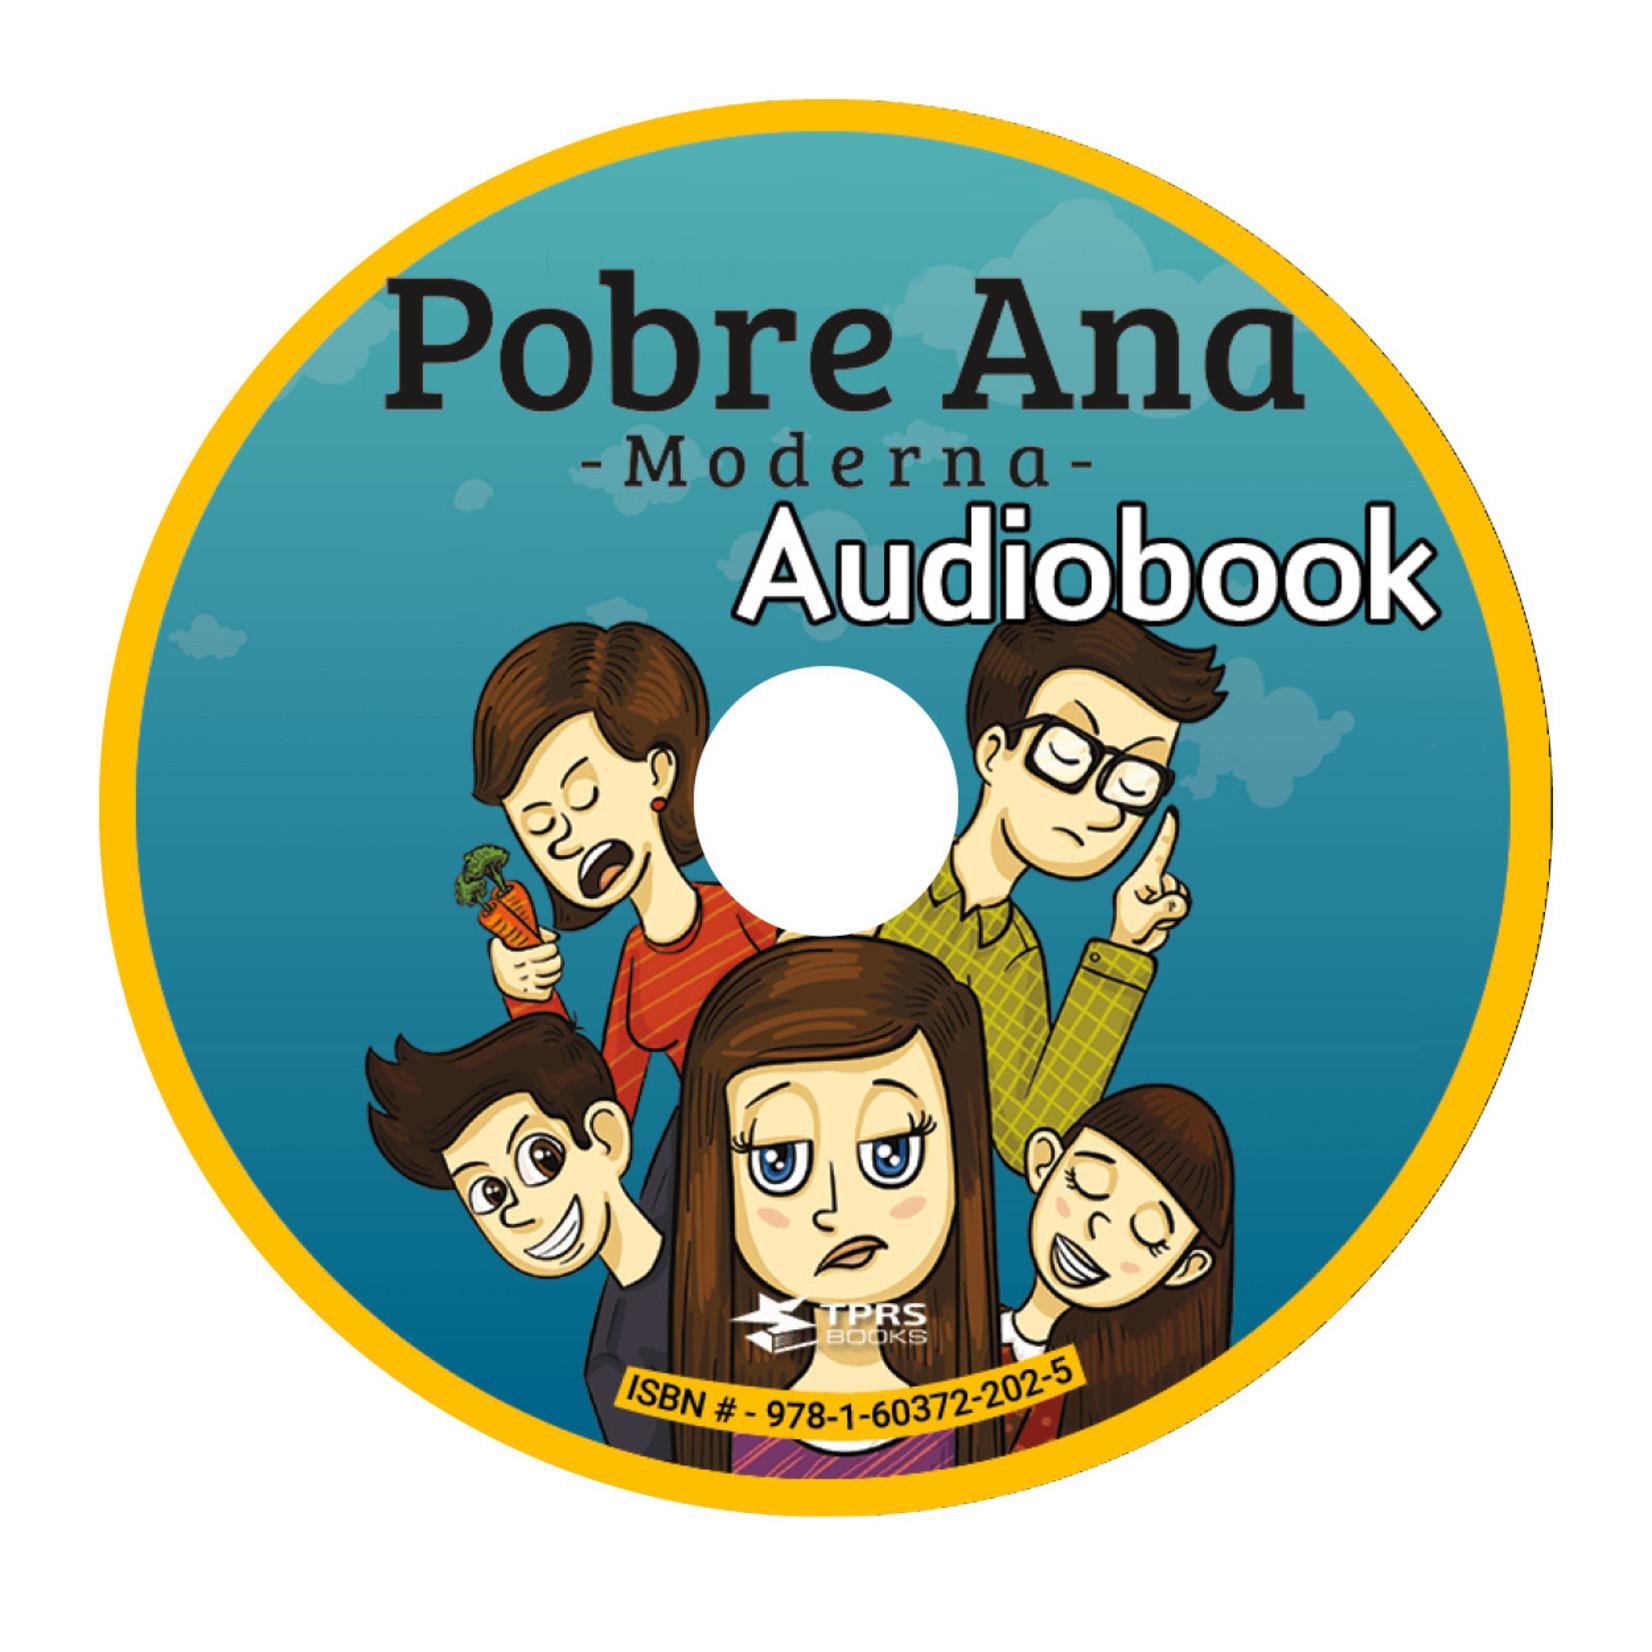 TPRS Books Pobre Ana moderna - Audiobook